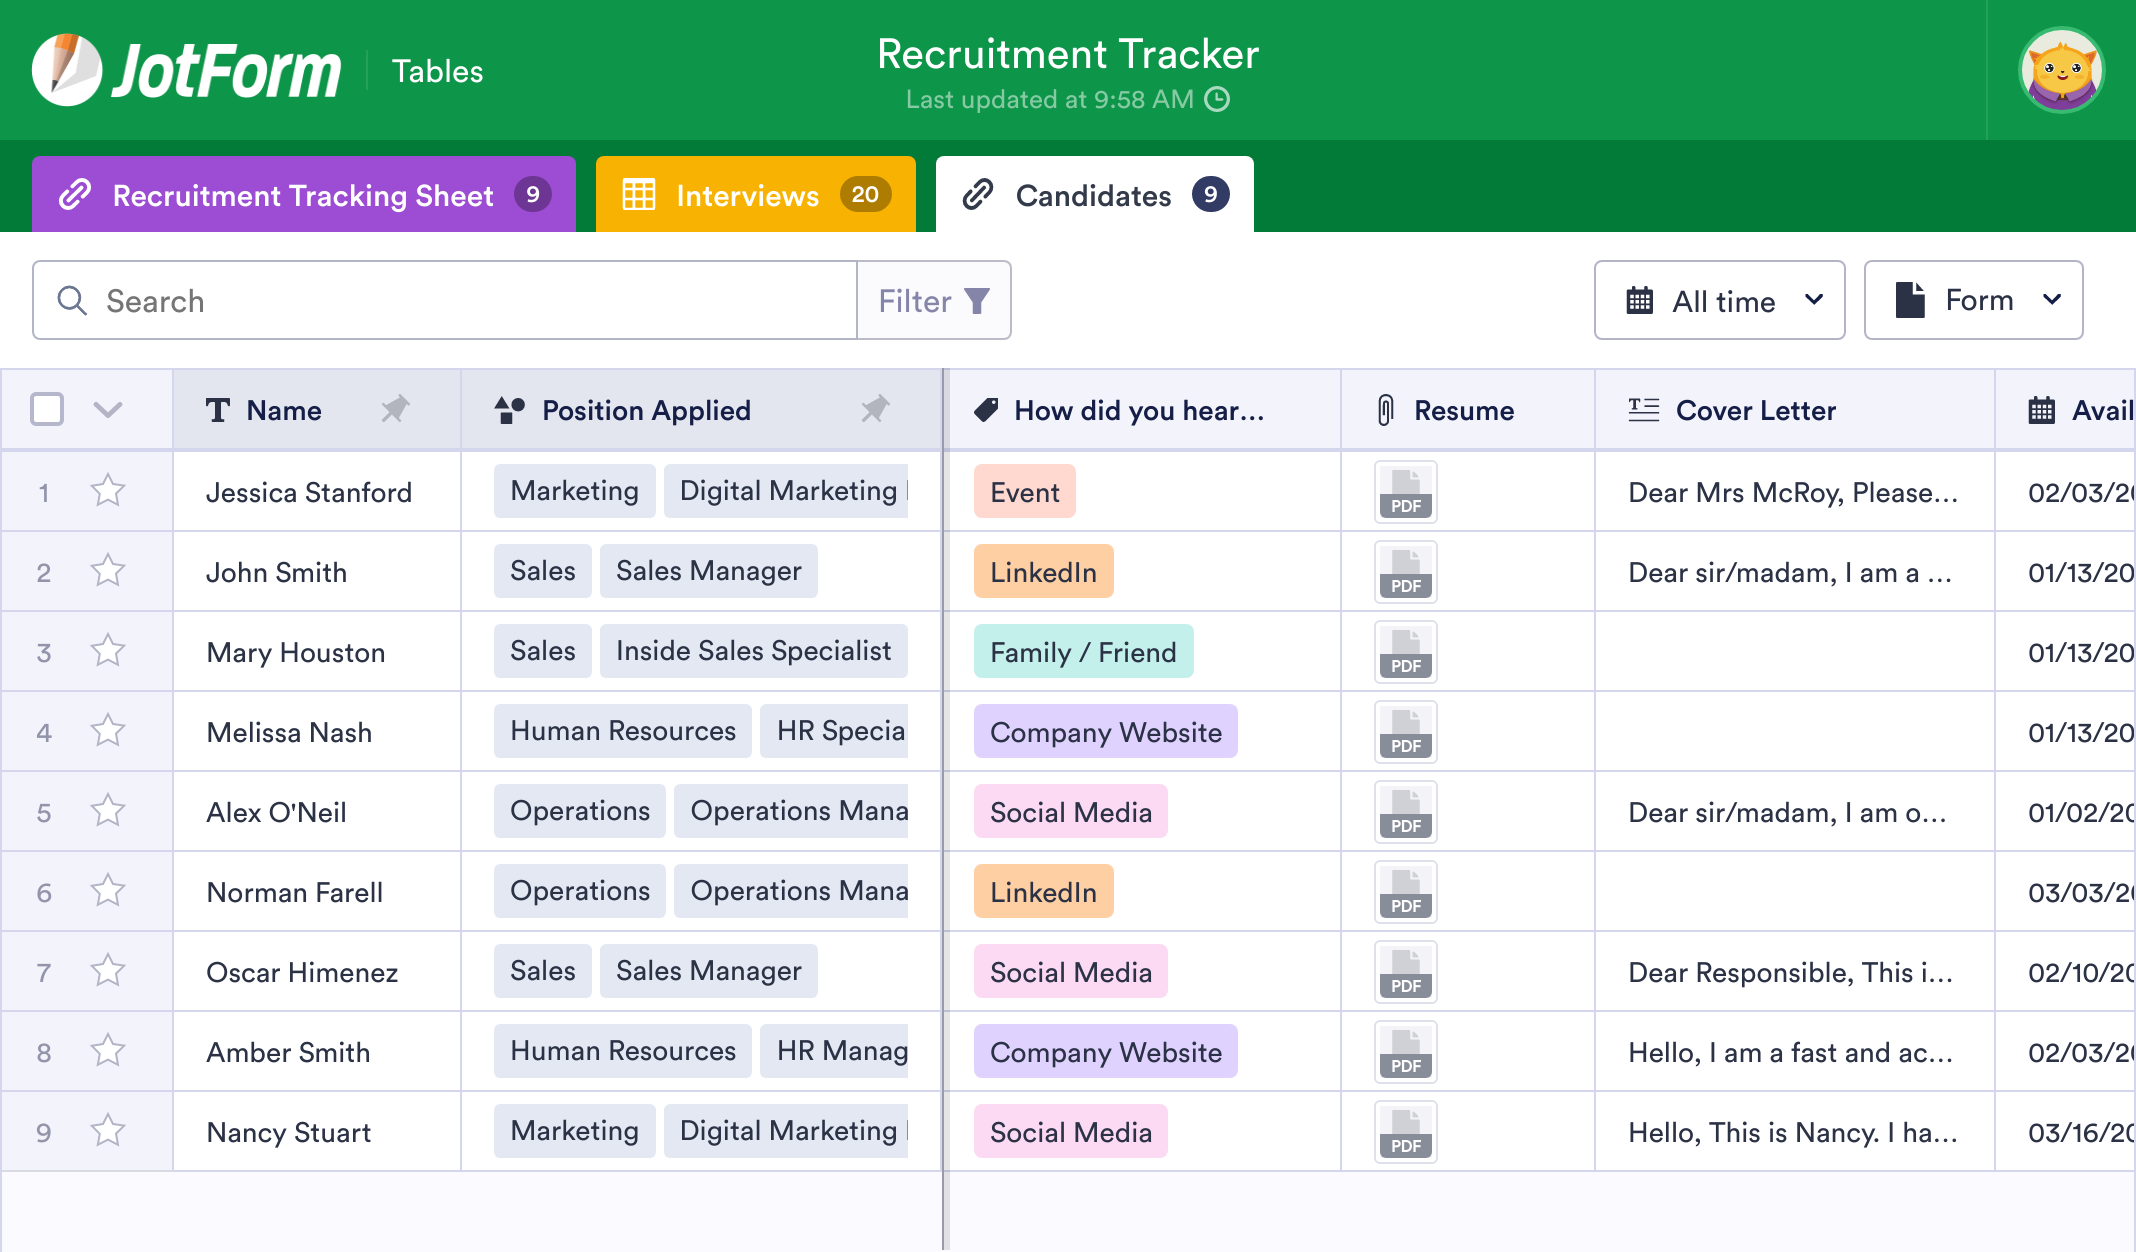 Recruitment Tracker